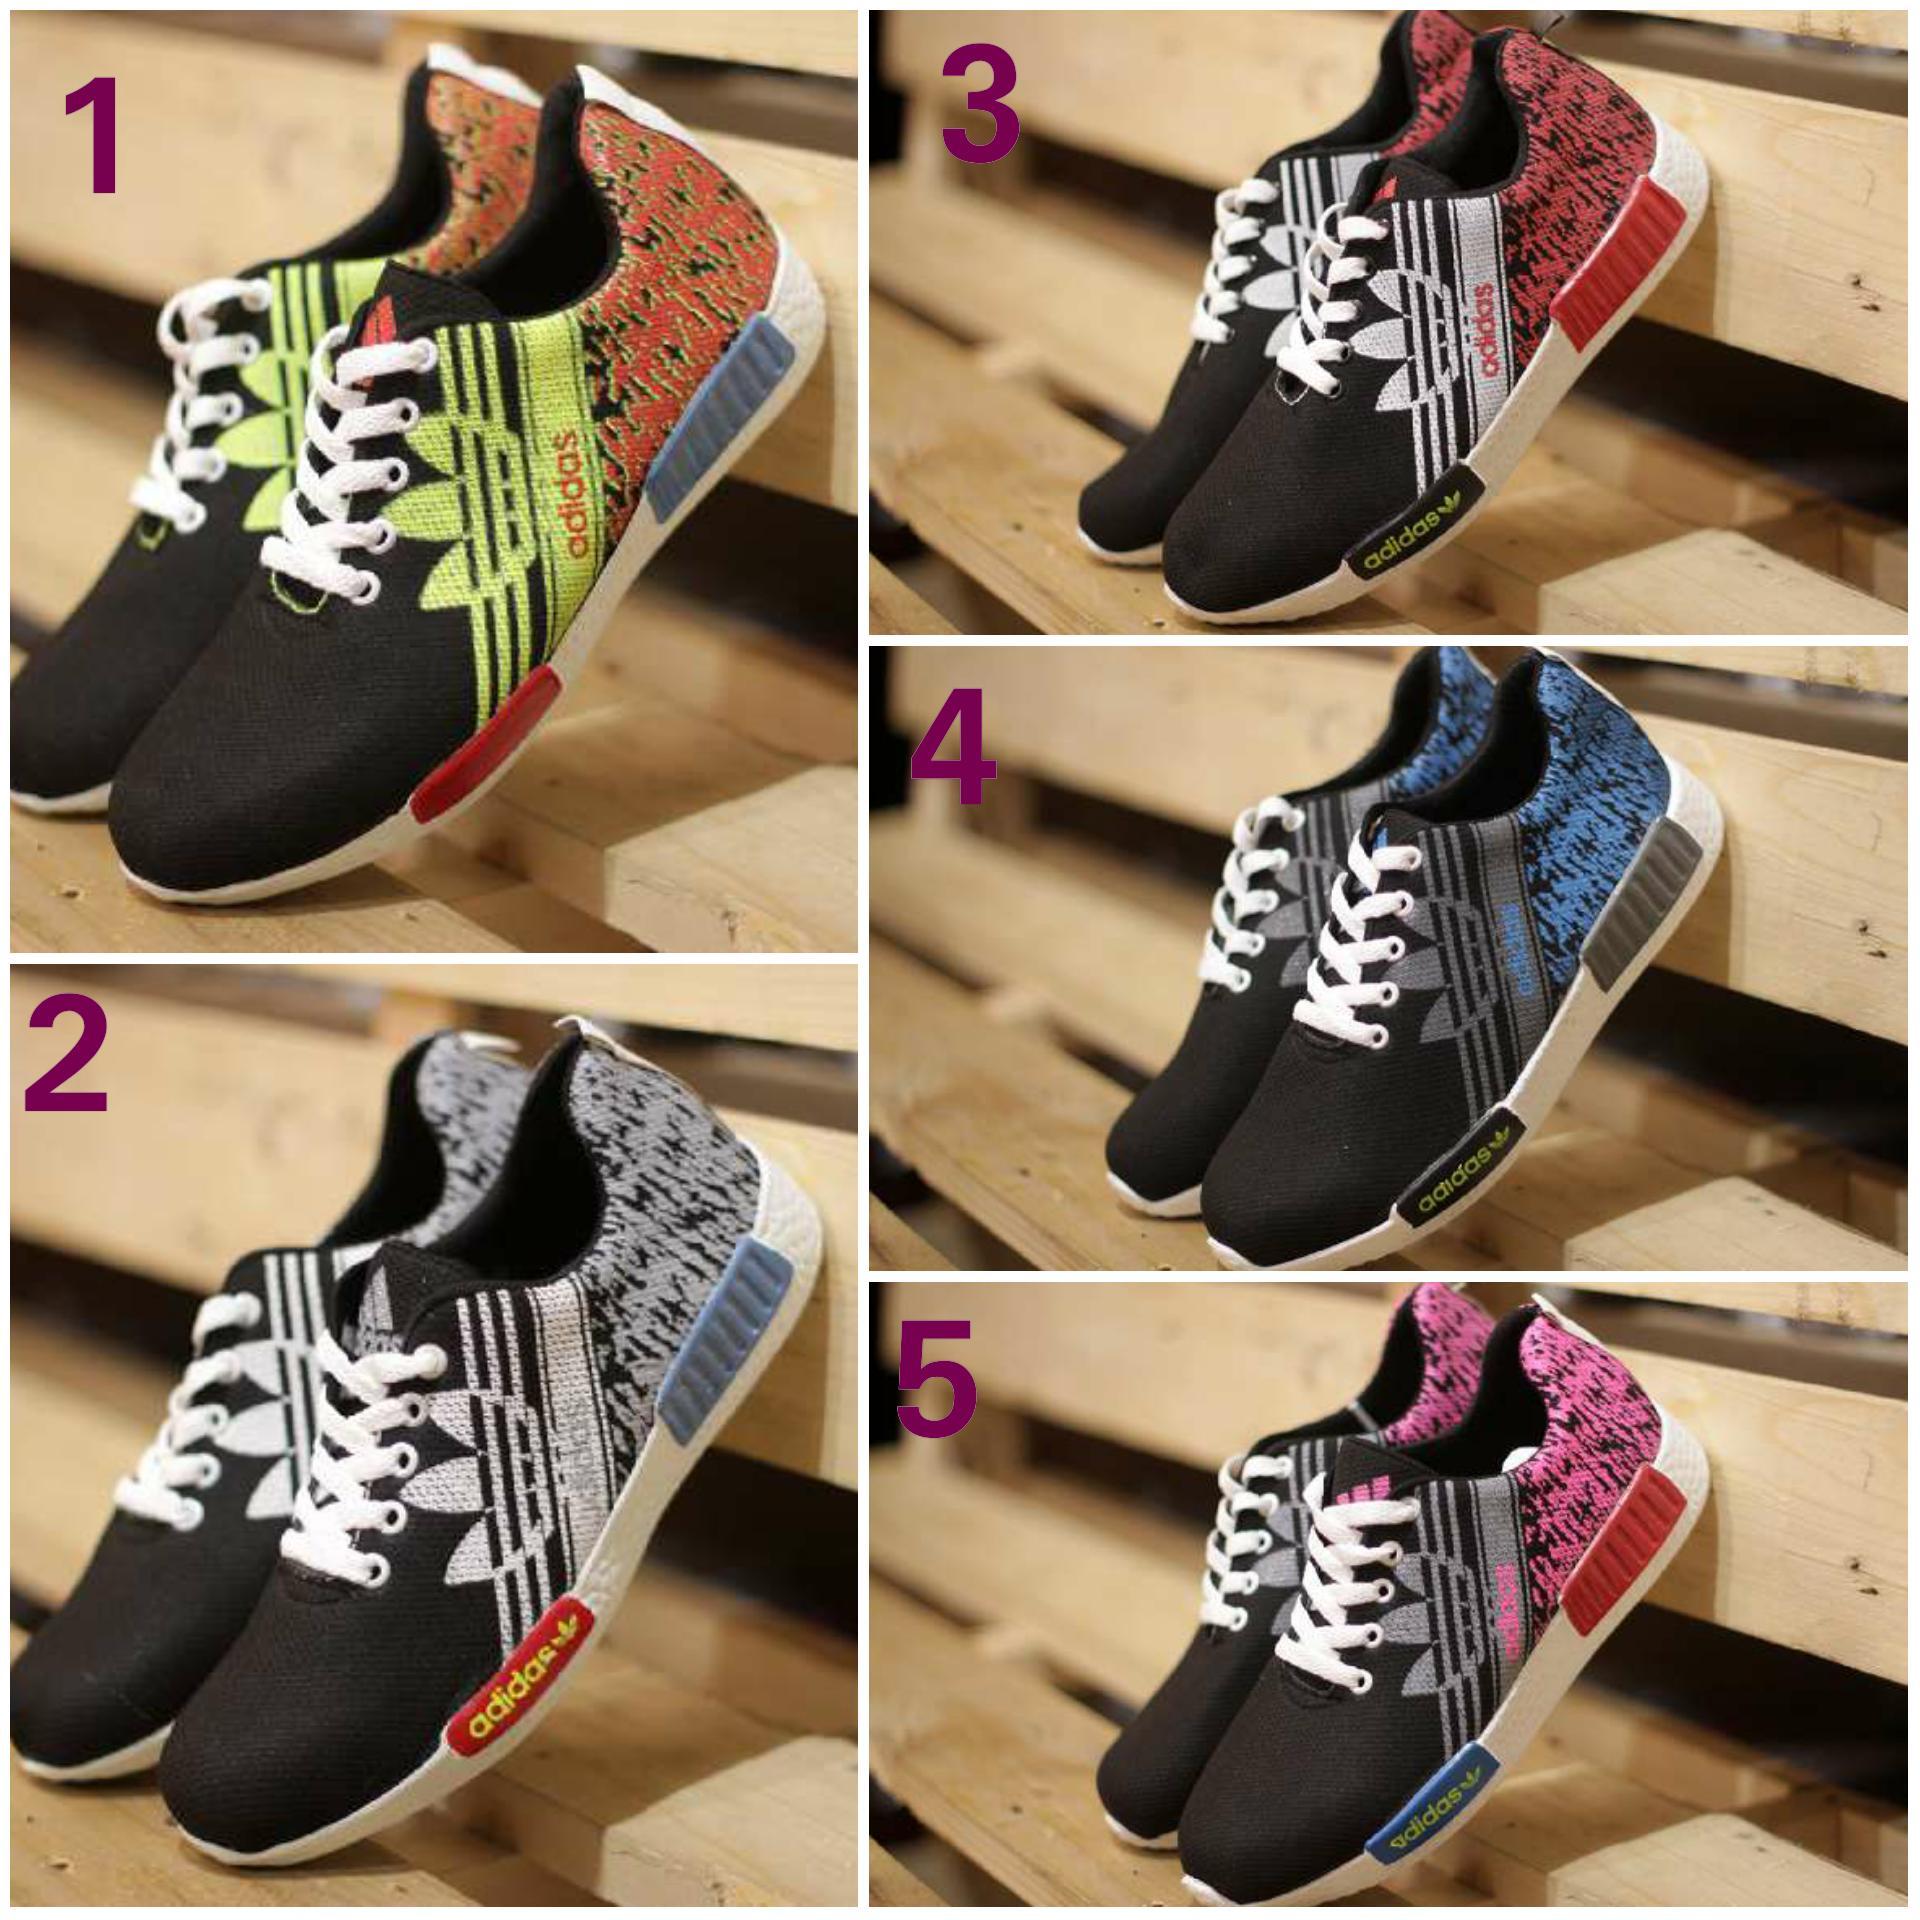 Promo Sepatu Adidas Neo Nmd Runner Sepatu Casual Wanita Ori Vietnam Fashion